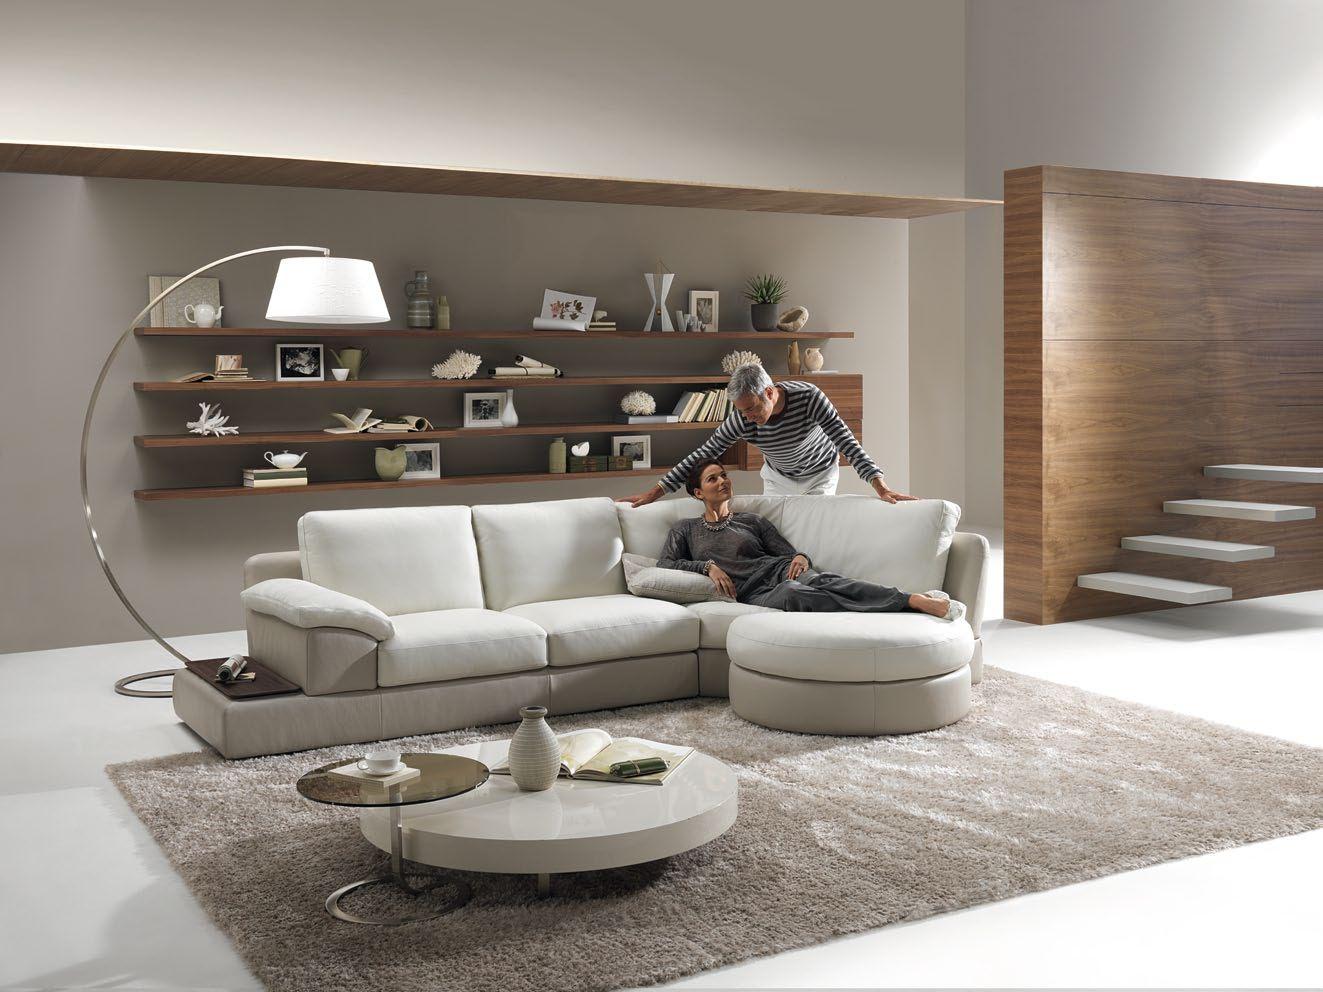 Modular Cabinets Living Room Good Living Room Furniture